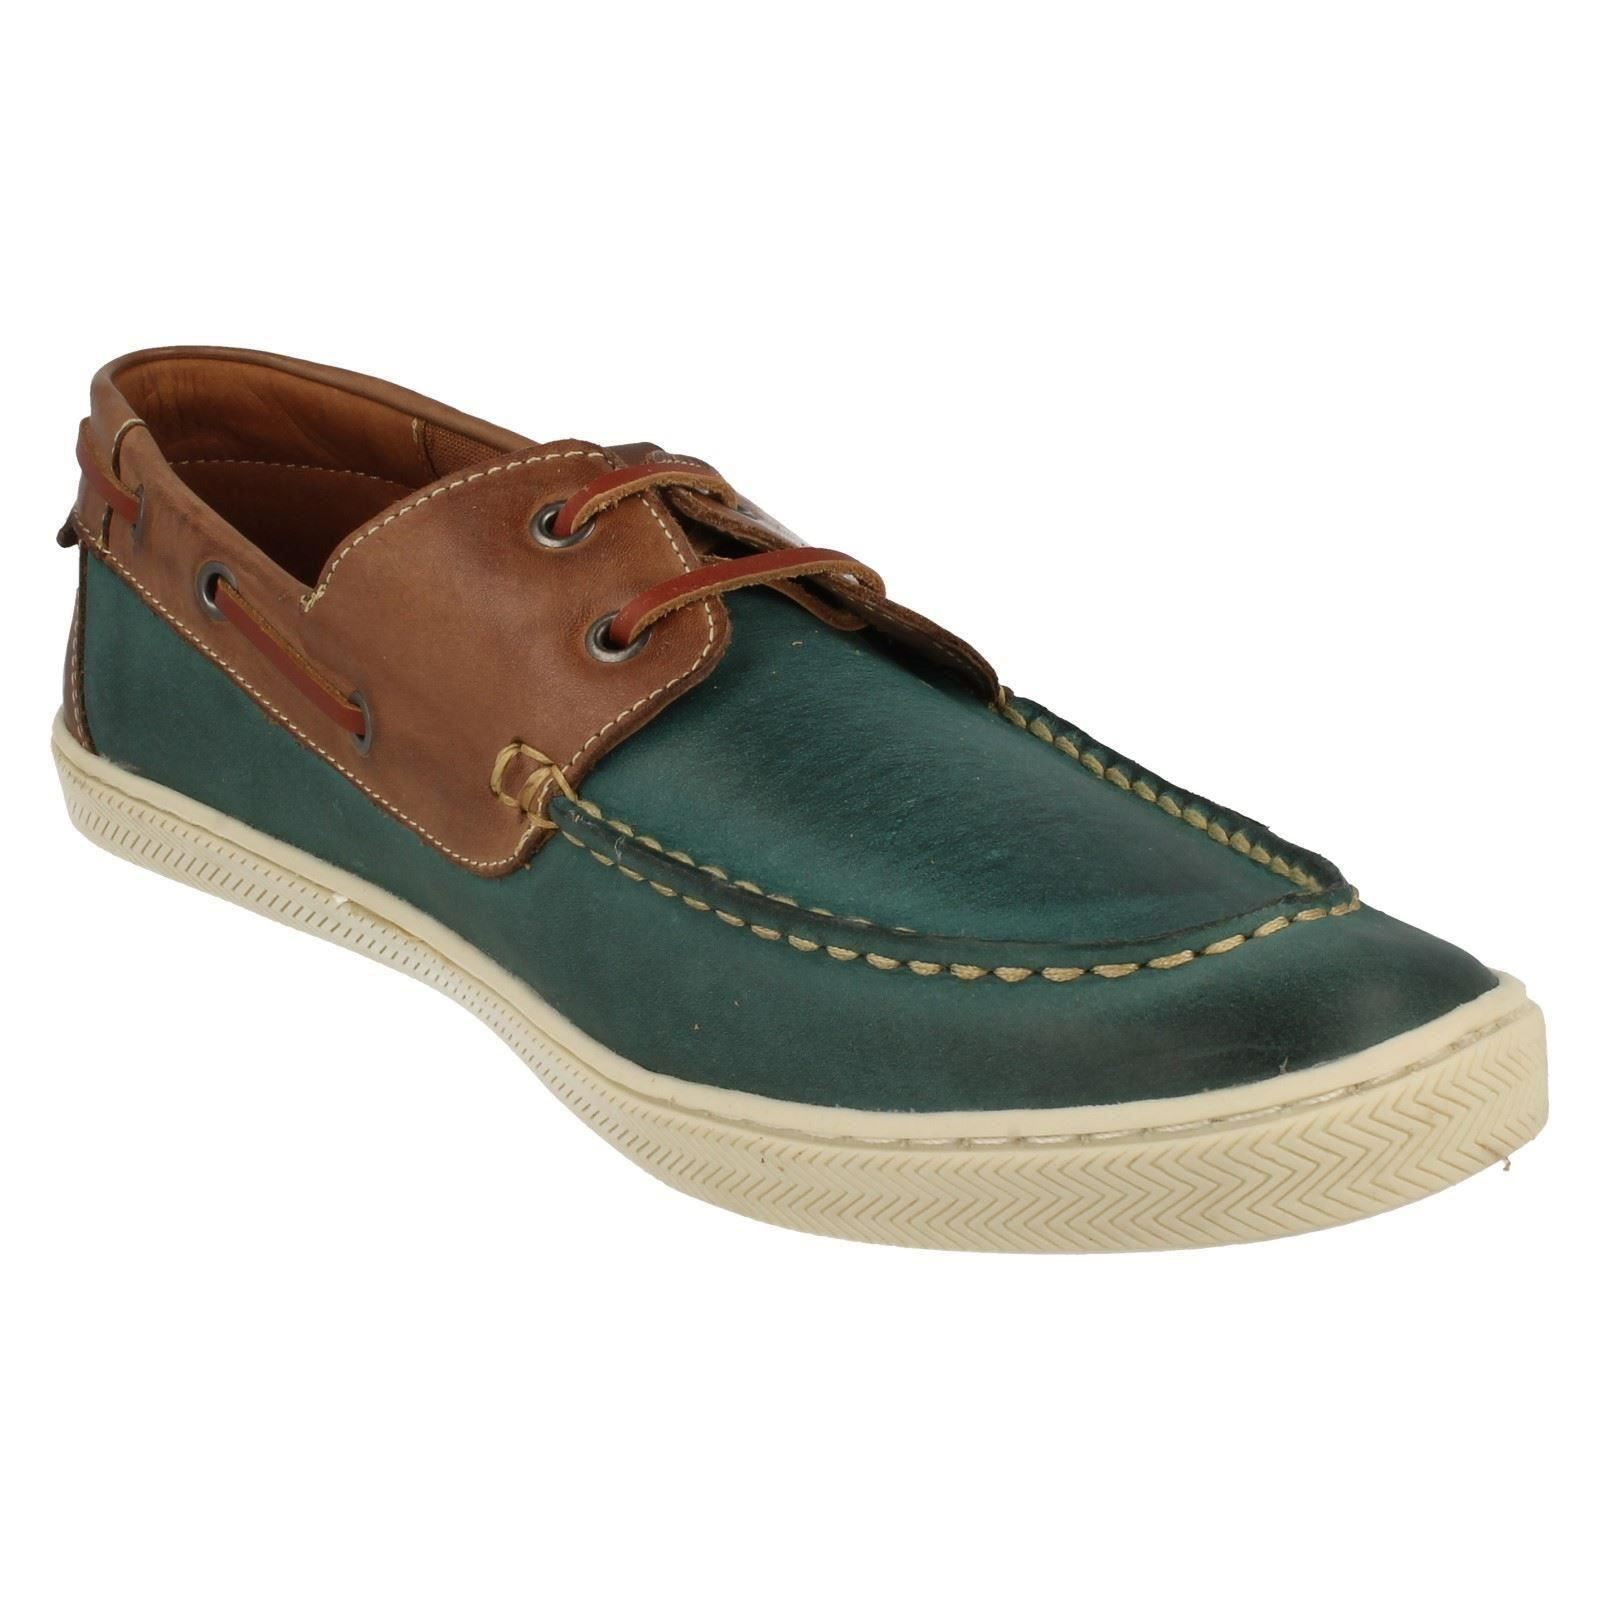 Billig hohe Schuhes Qualität Mens Anatomic Deck Schuhes hohe Lorena 086dd6